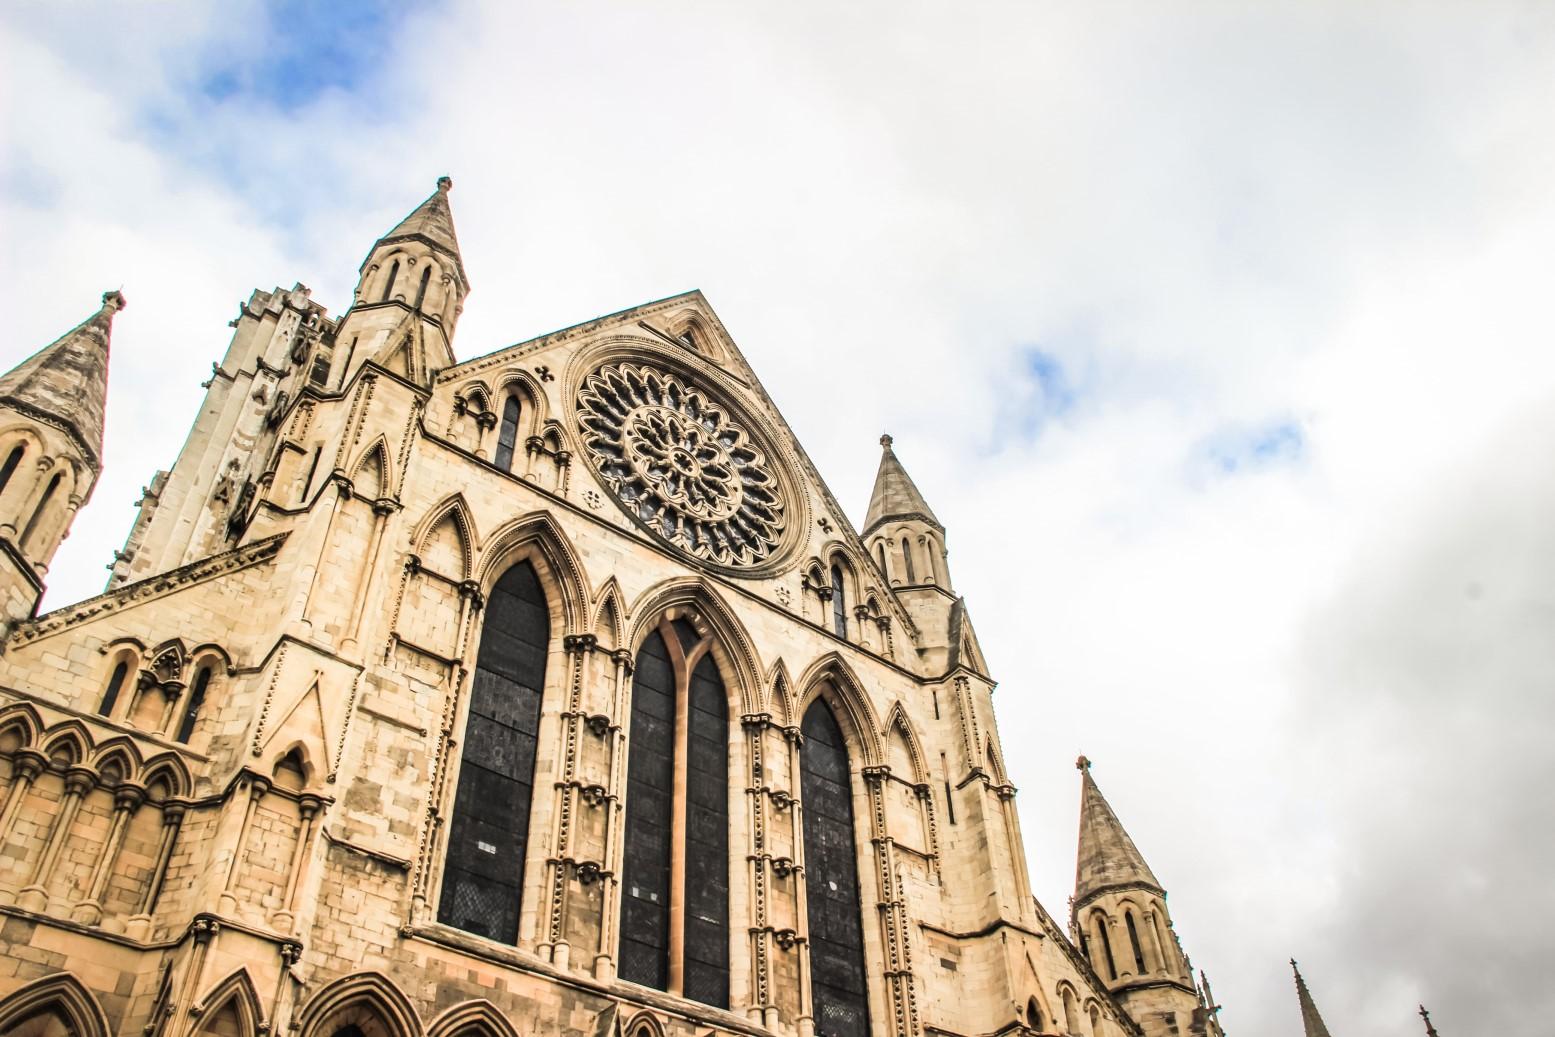 cathédrale d'York en Angleterre